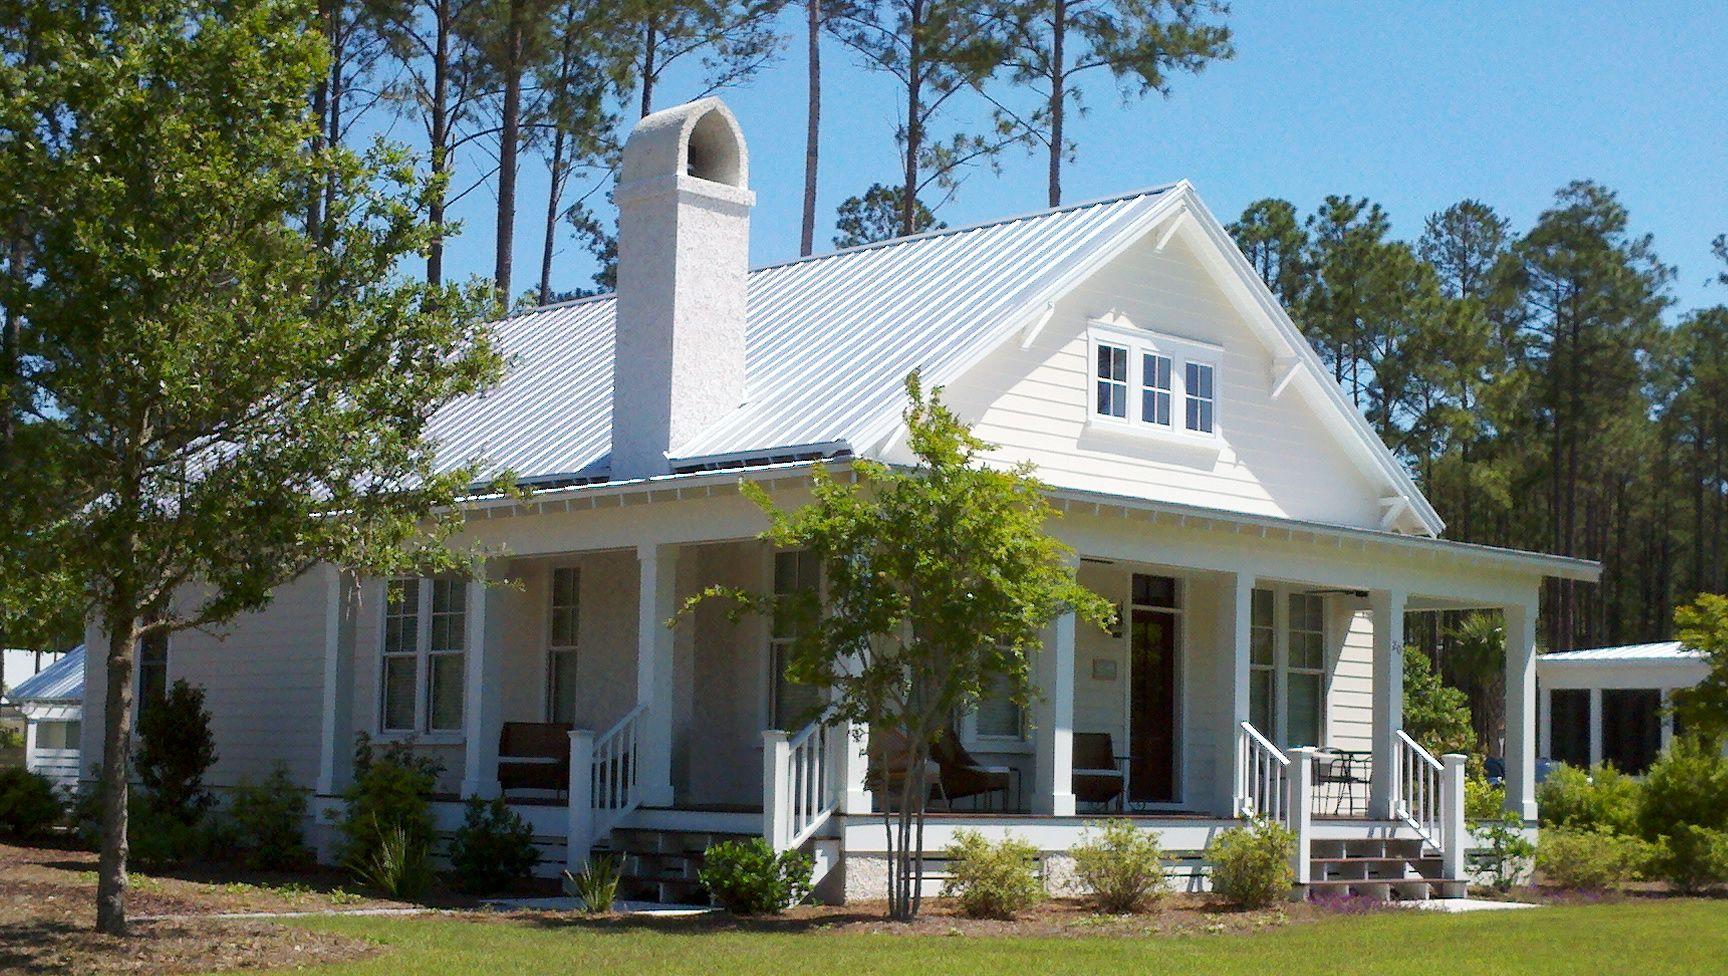 Whisper Creek Cottage House Plan (C0568) Design from Allison Ramsey ...